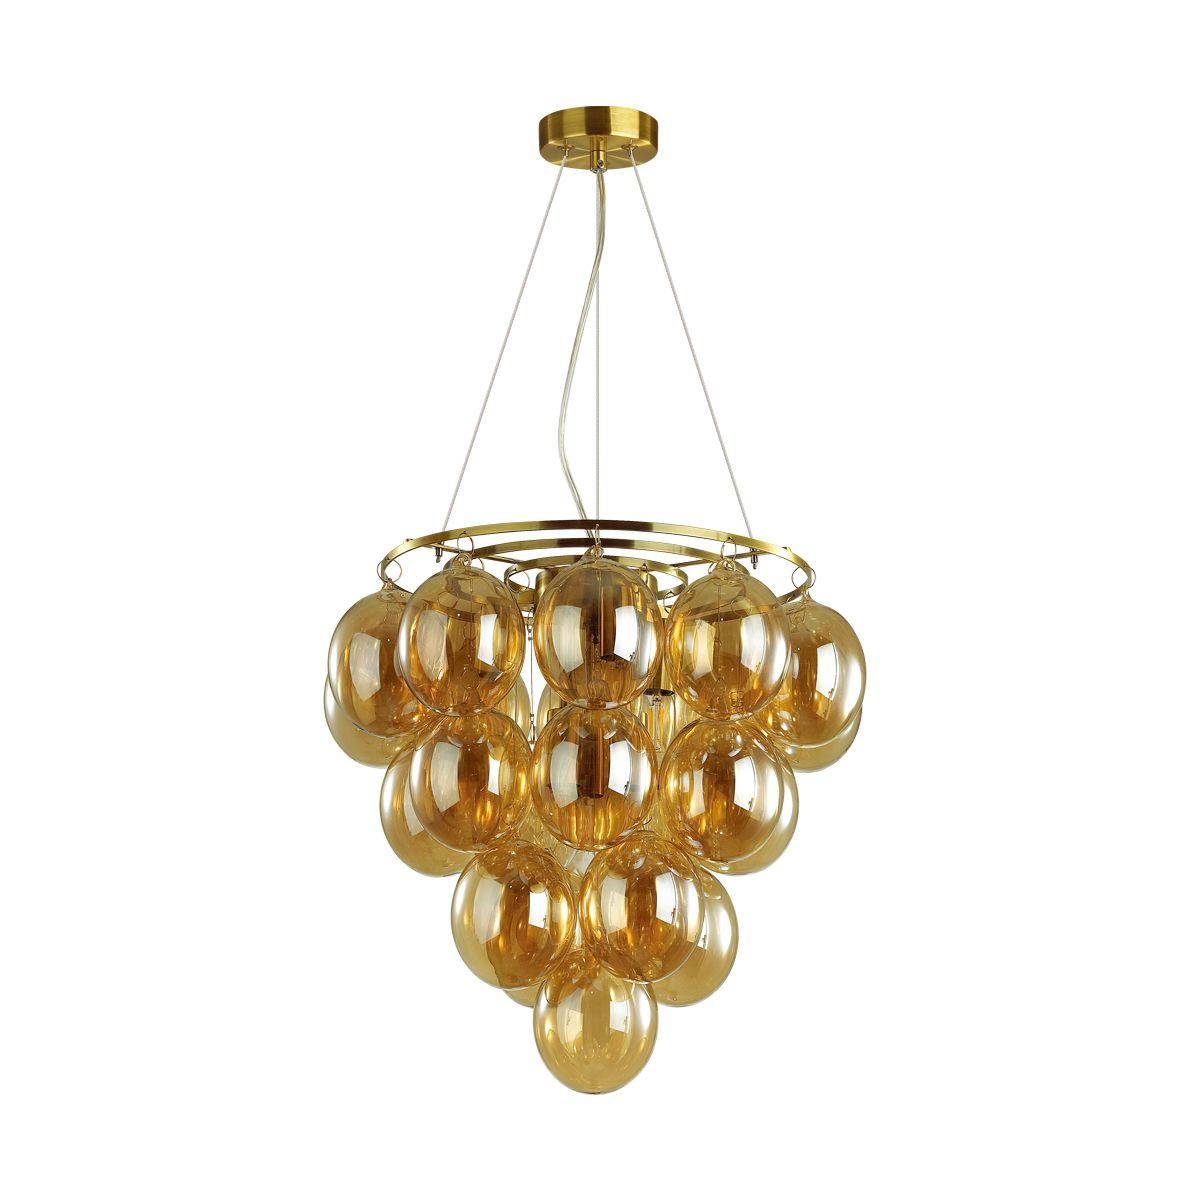 Светильник Odeon Light 4812/6 Modern светильник odeon light 3807 1b modern